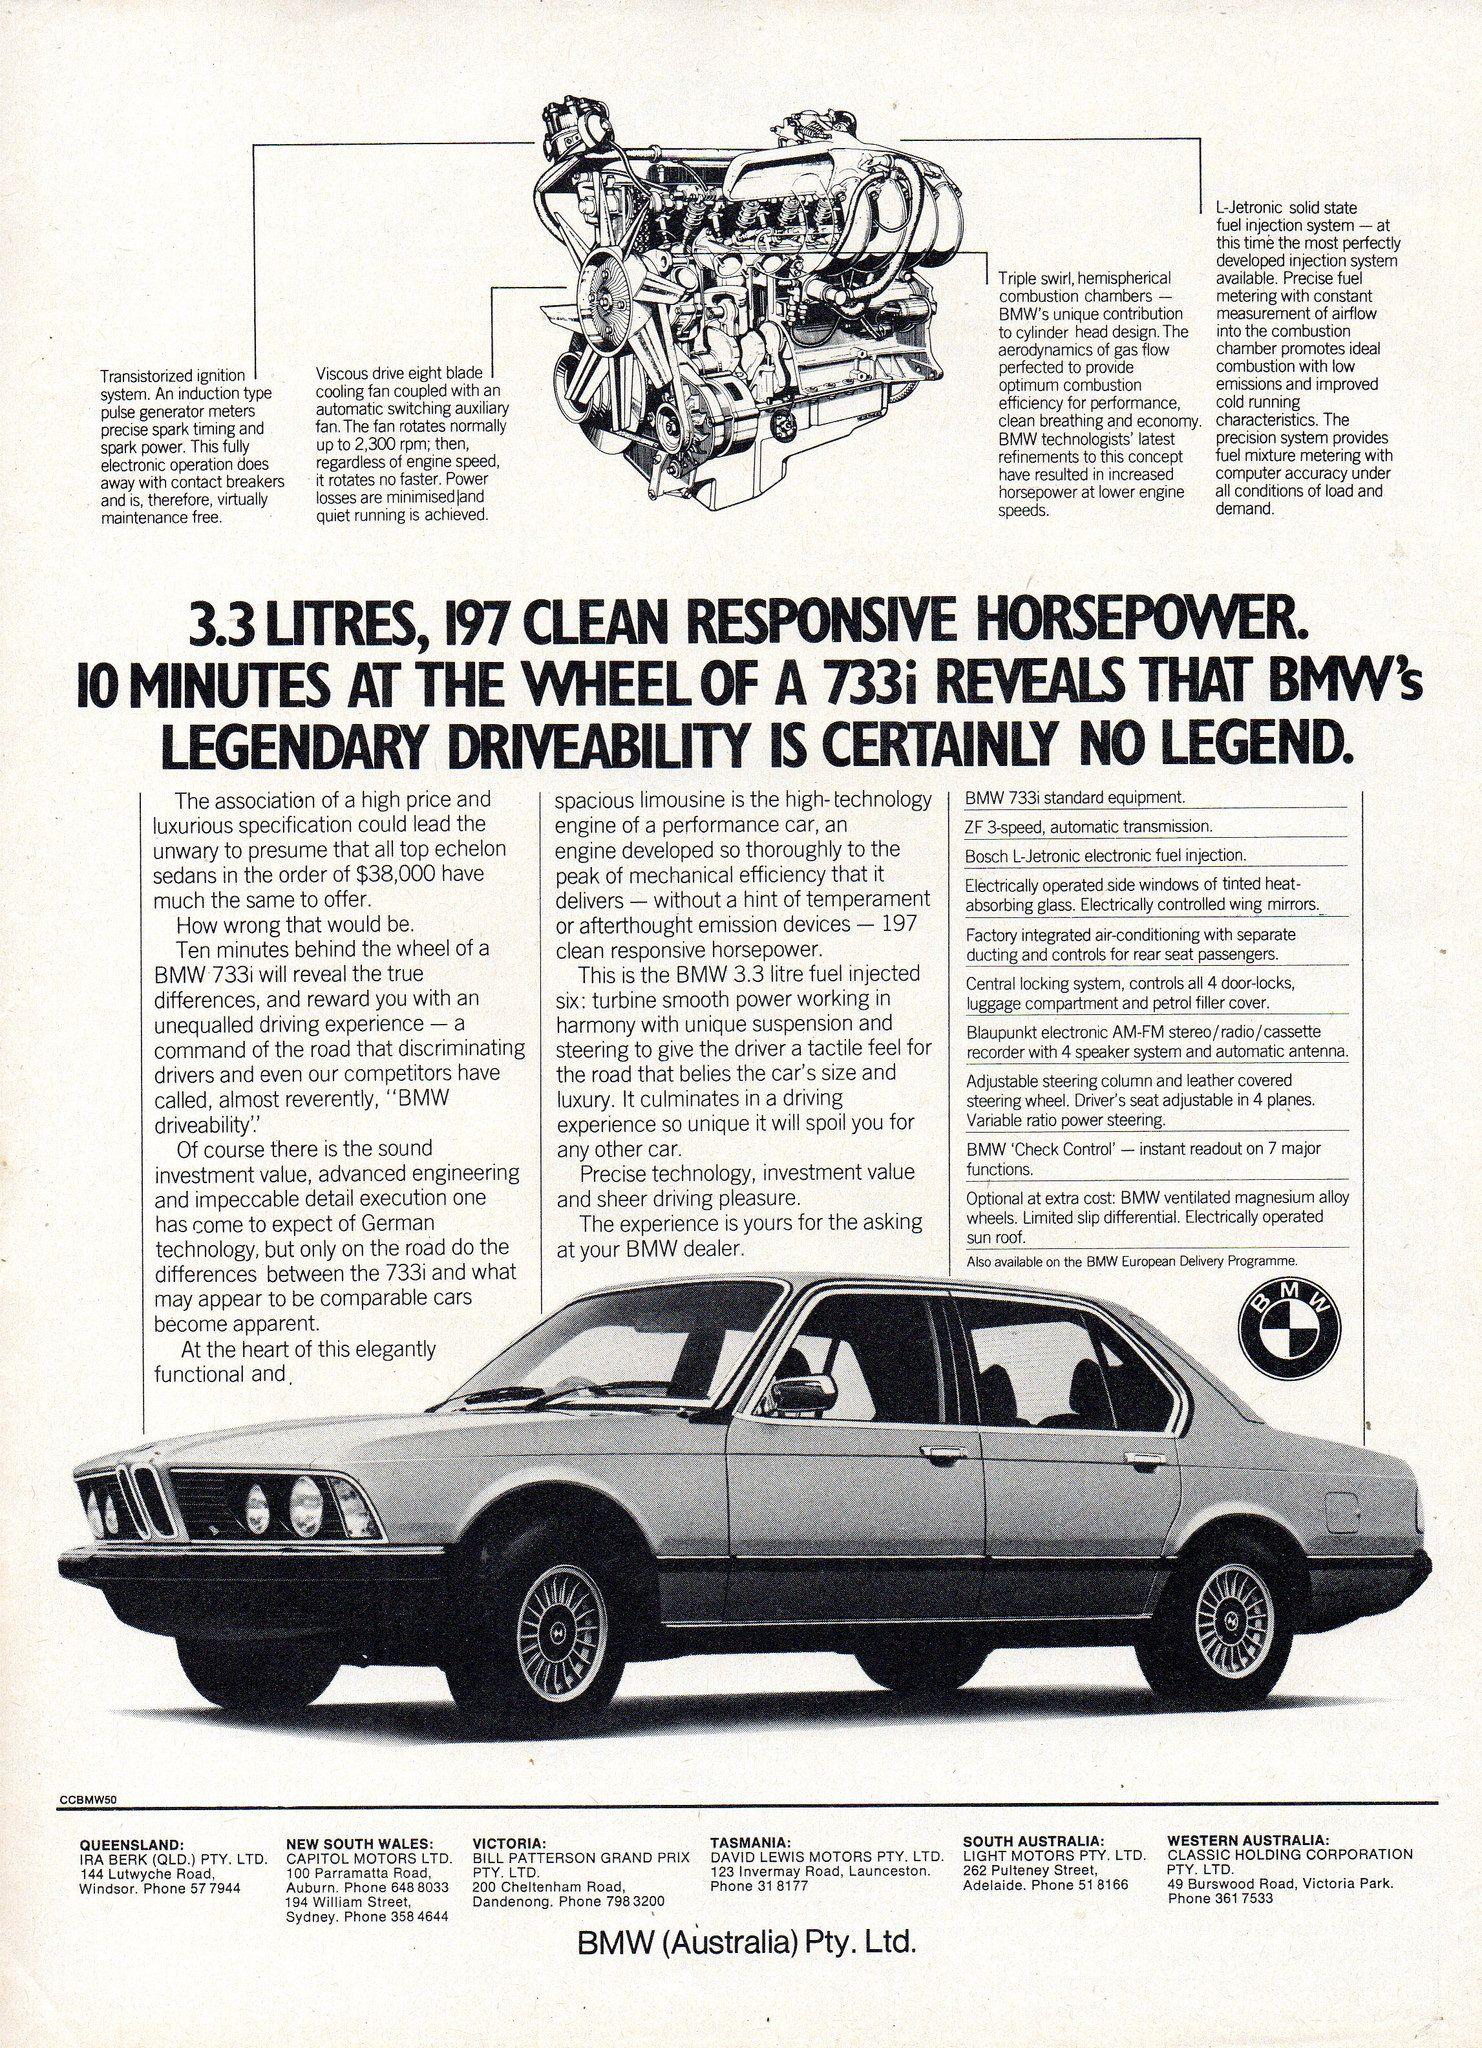 1978 Bmw 733i 3 3 Litre Sedan Aussie Original Magazine Advertisement Bmw Bmw Series Australian Cars